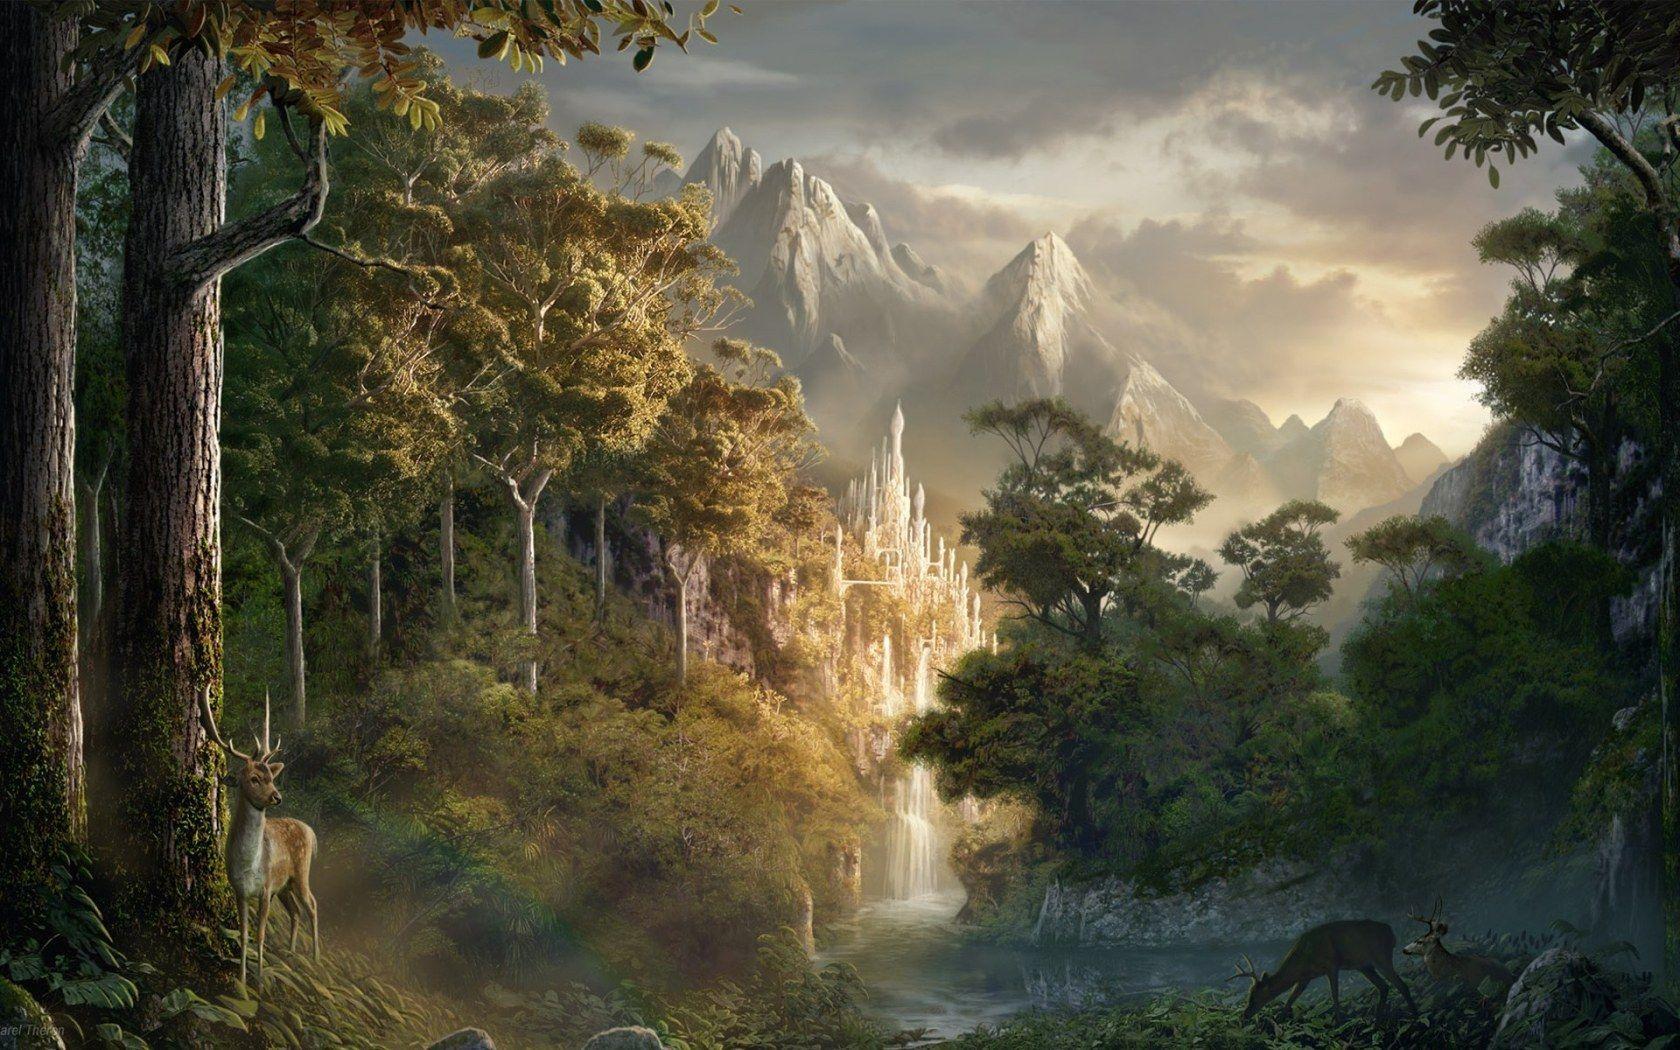 Magical Landscape Wallpapers Top Free Magical Landscape